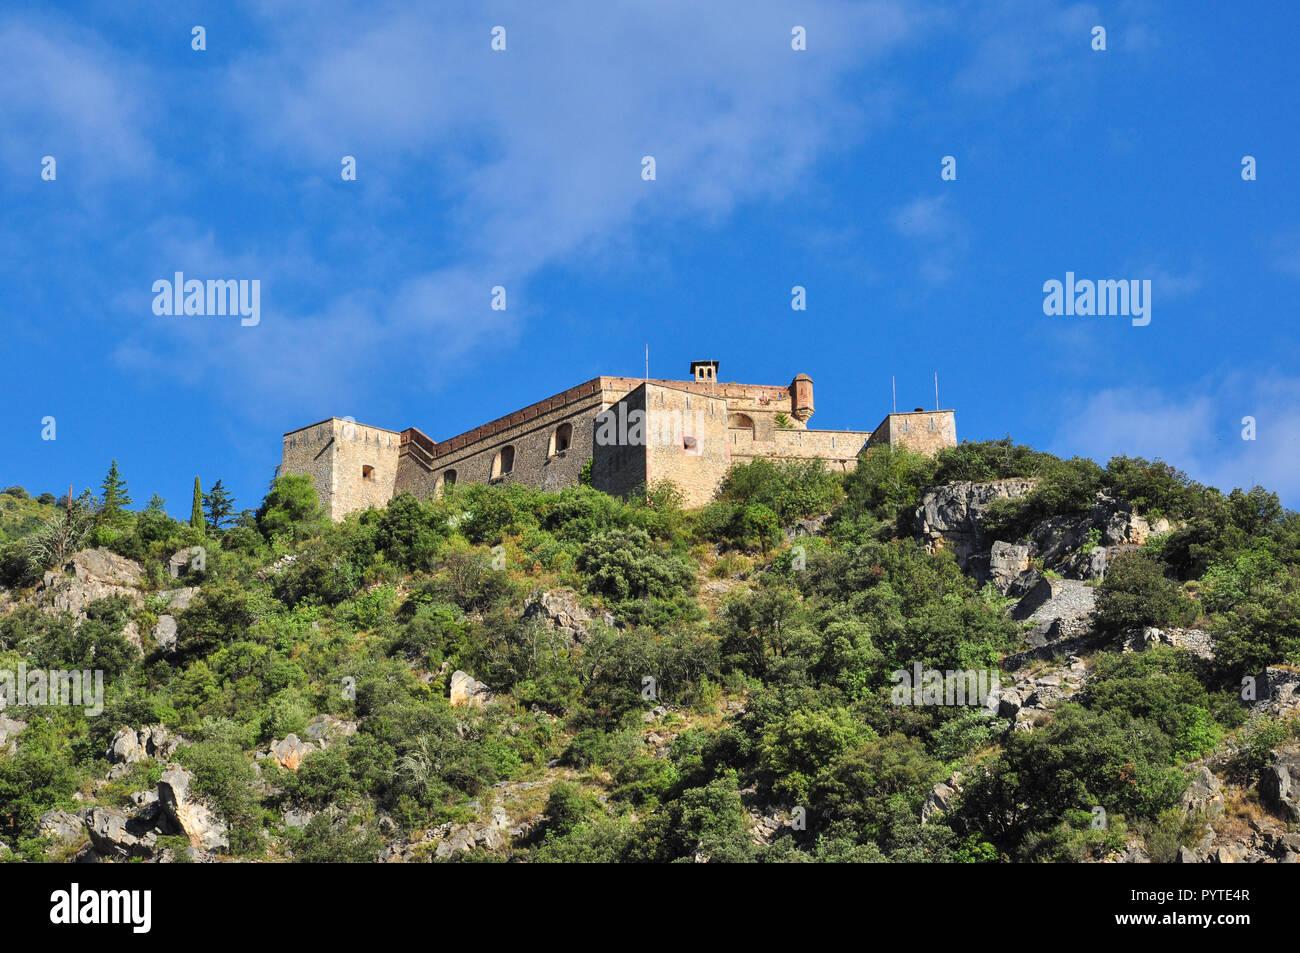 Fort Liberia, Villefranche-de-Conflent, Pyrenees-Orientales, Occitanie, France - Stock Image